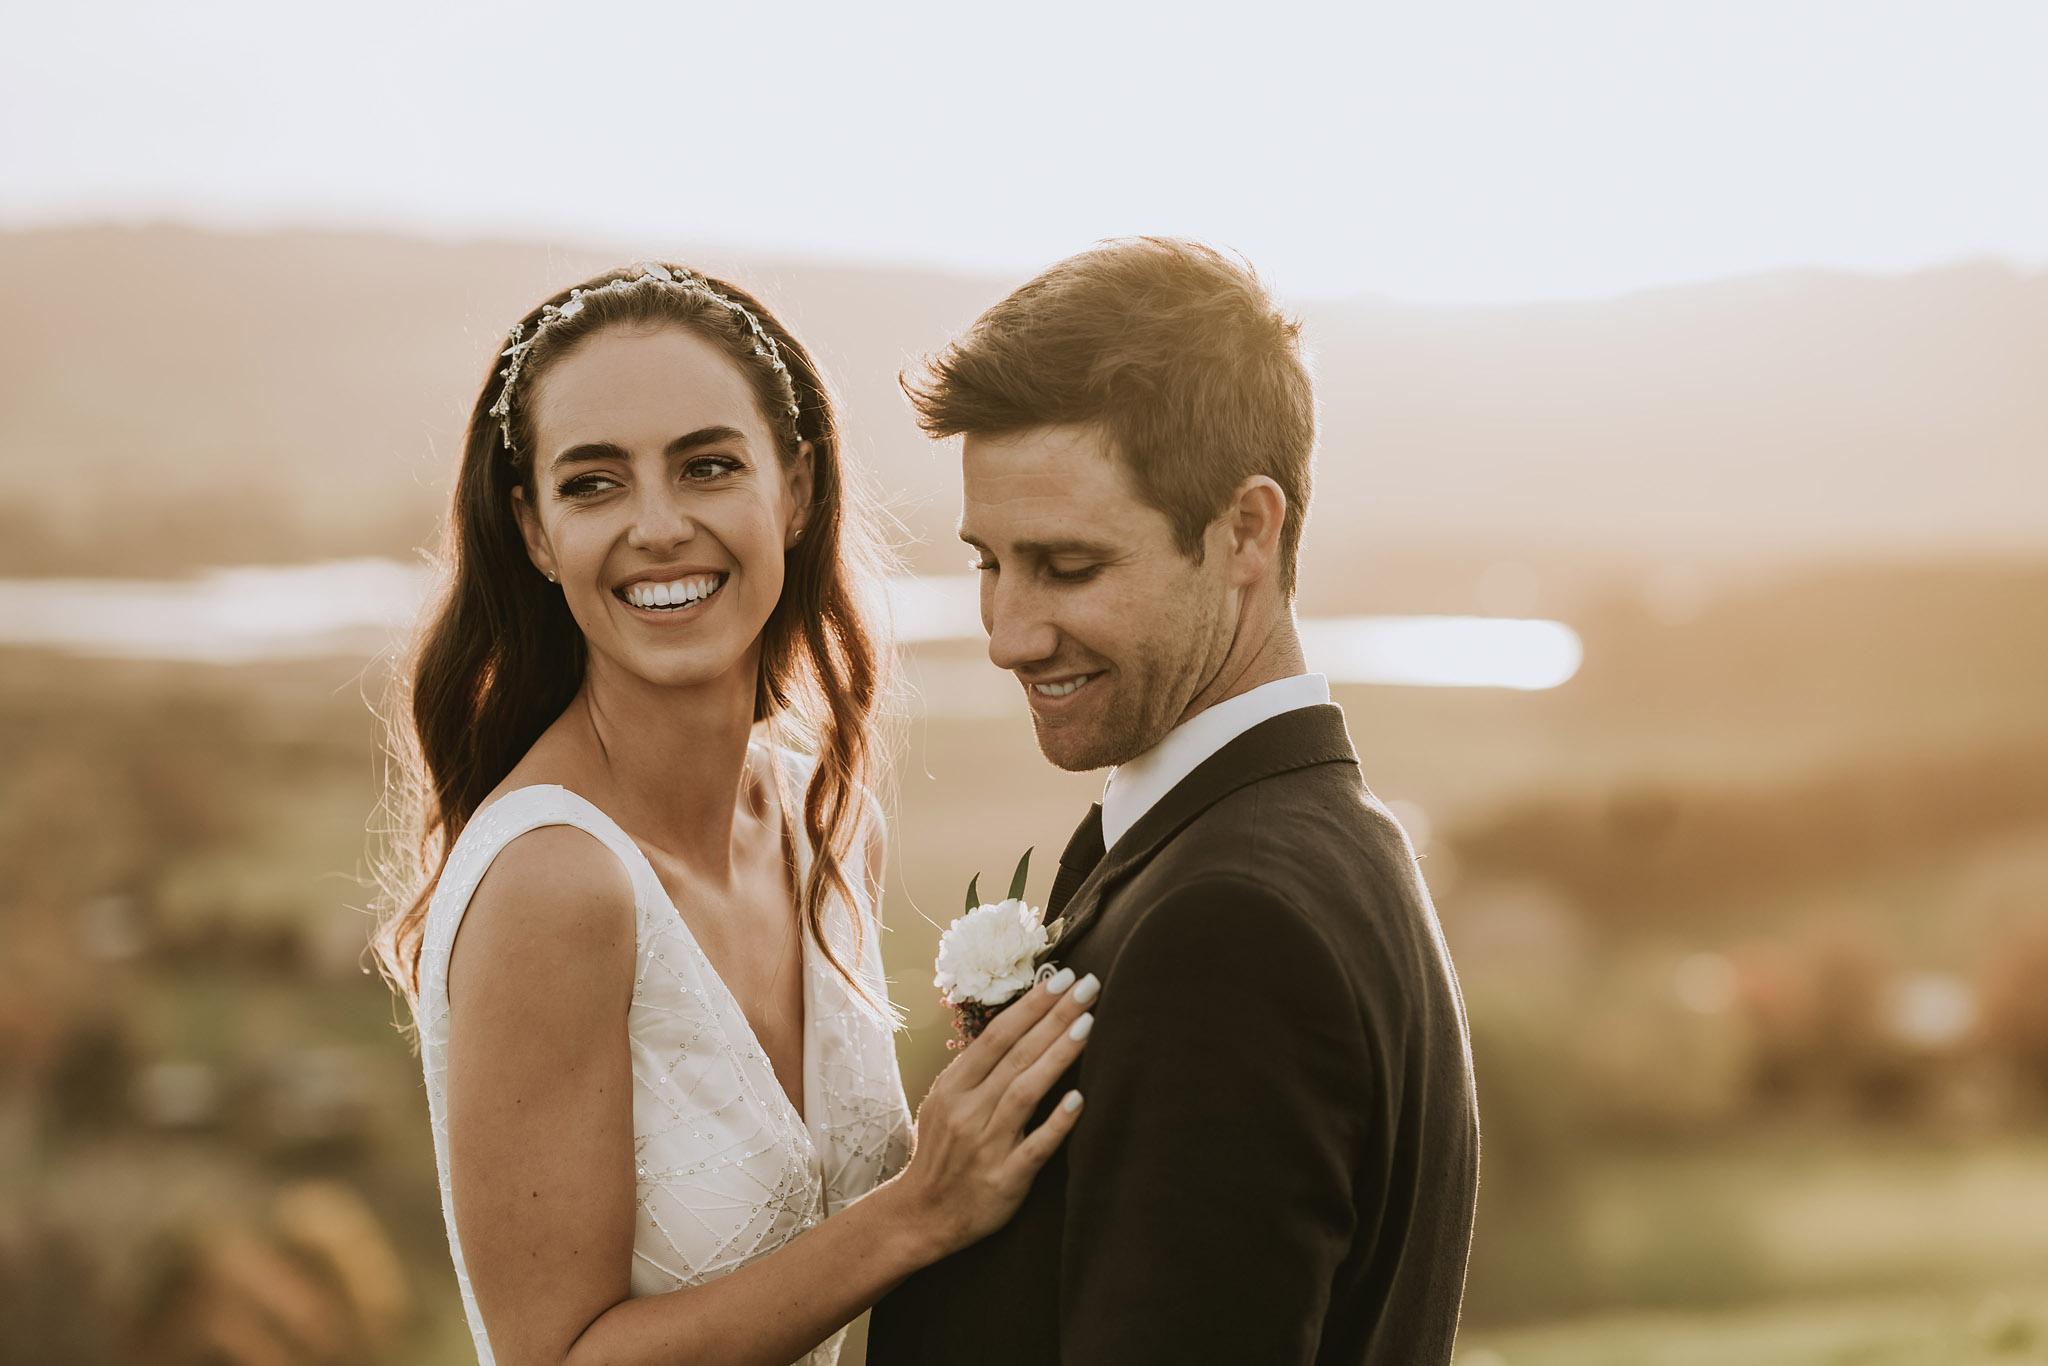 rambo-estrada-rubymatt-kauri-bay-boomrock-auckland-wedding-photographers-0676-c copy.jpg